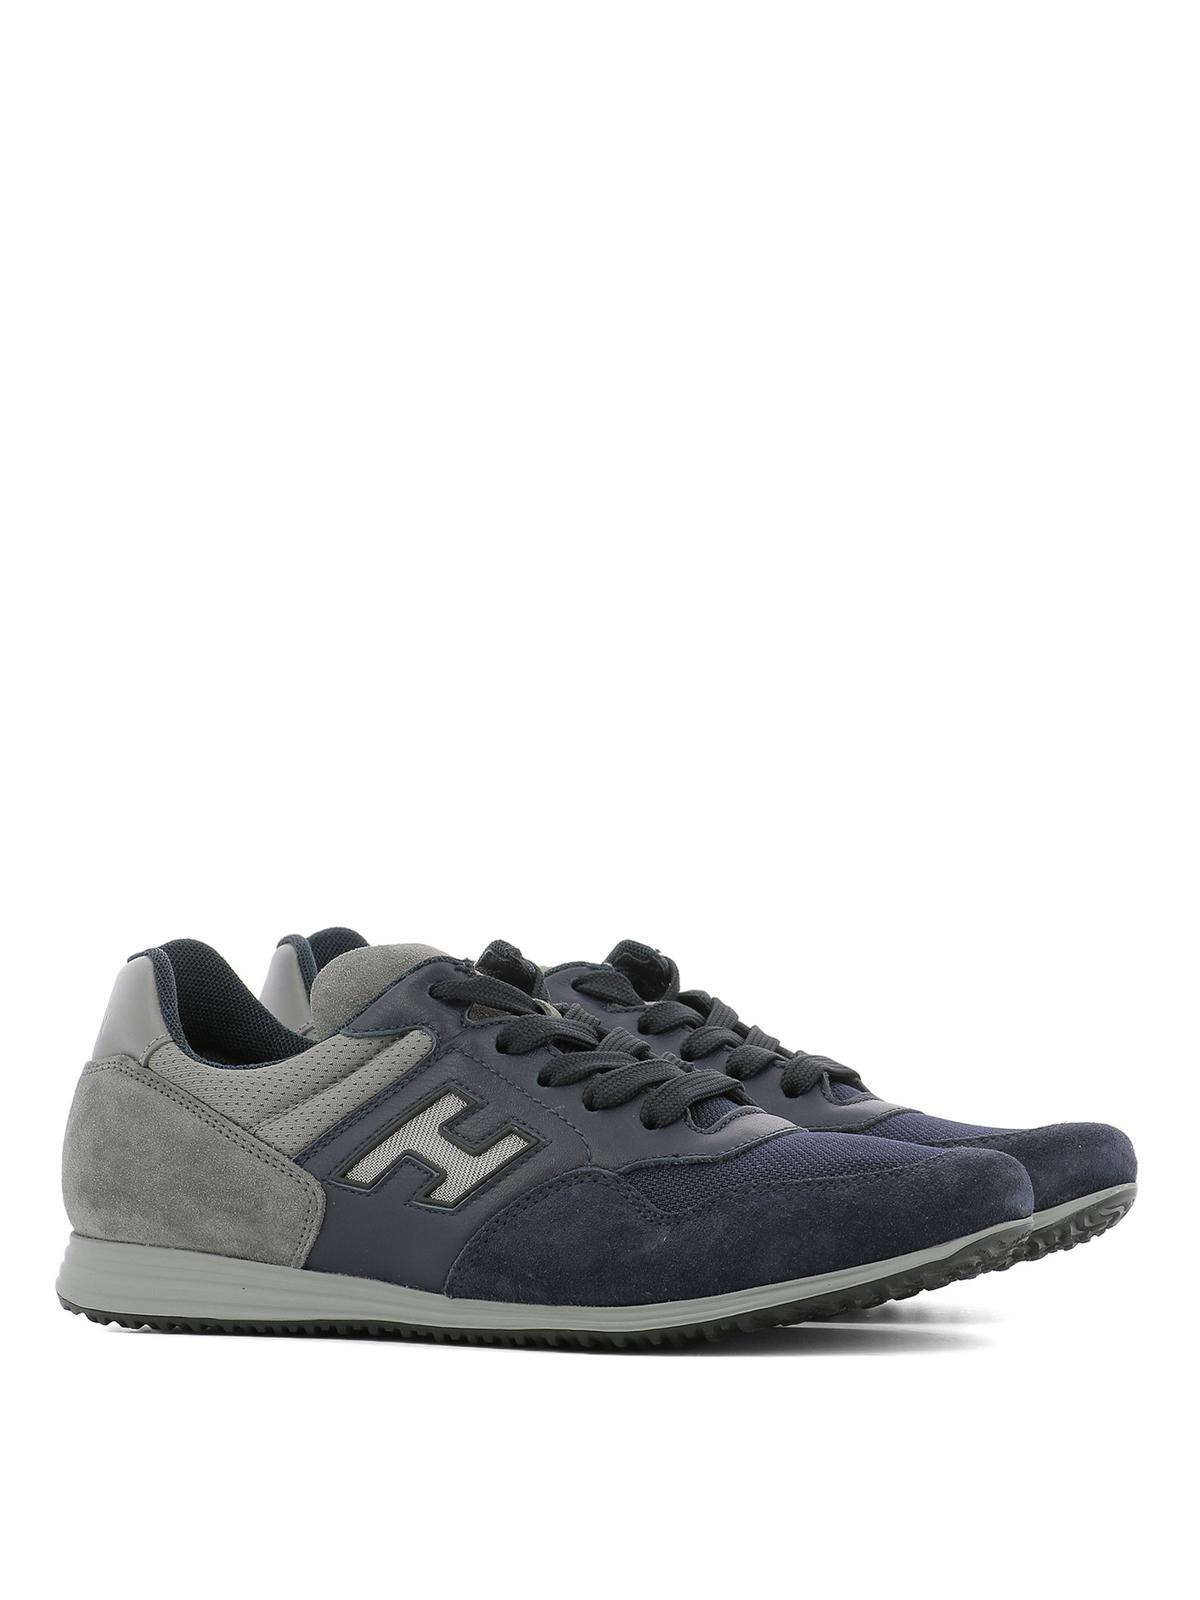 Olympia X - H205 sneakers - Blue Hogan 9PyJZxbeLs